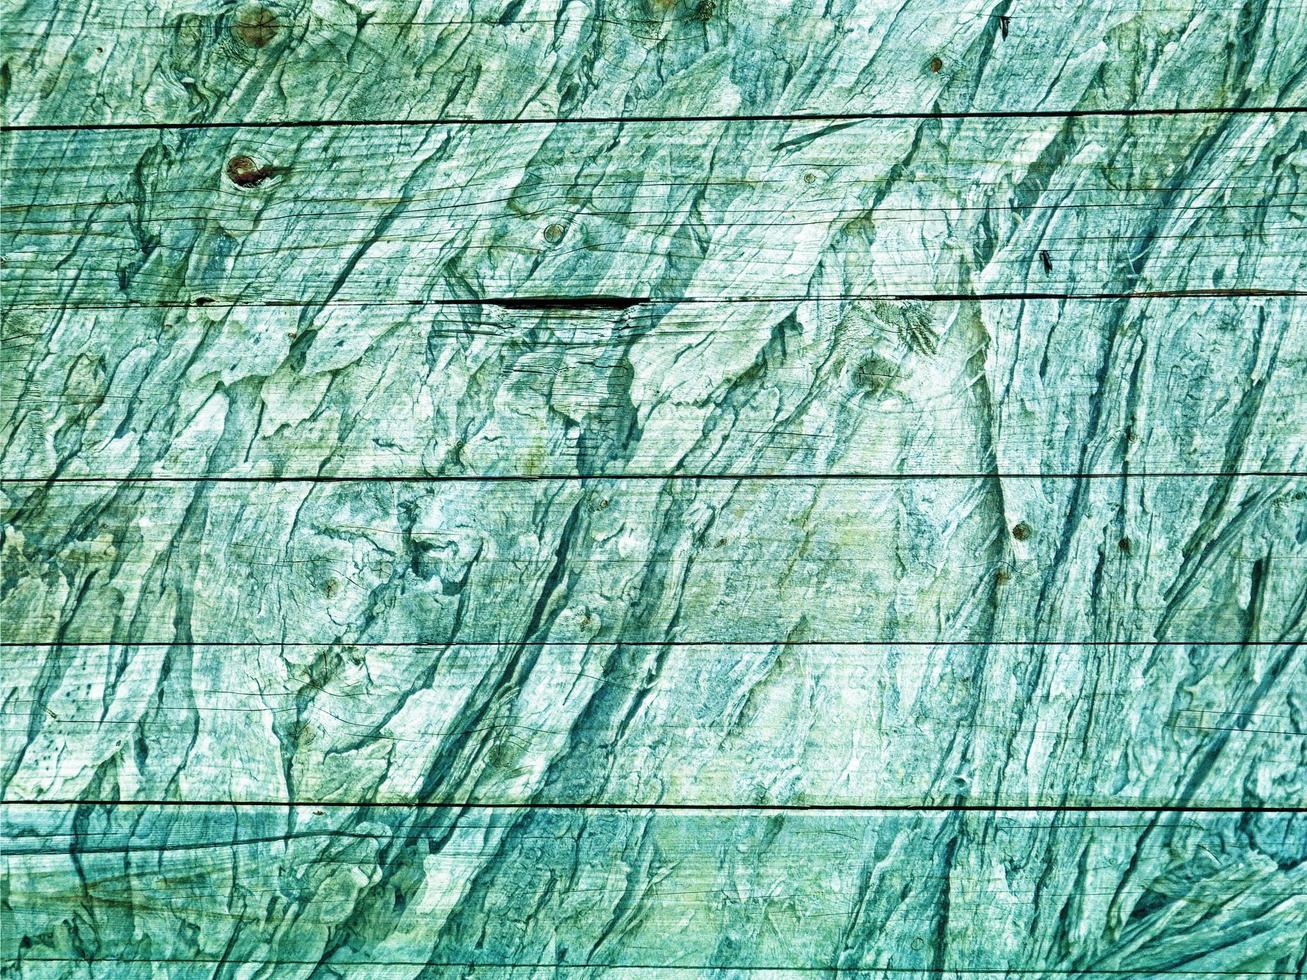 struttura in legno verde acqua foto